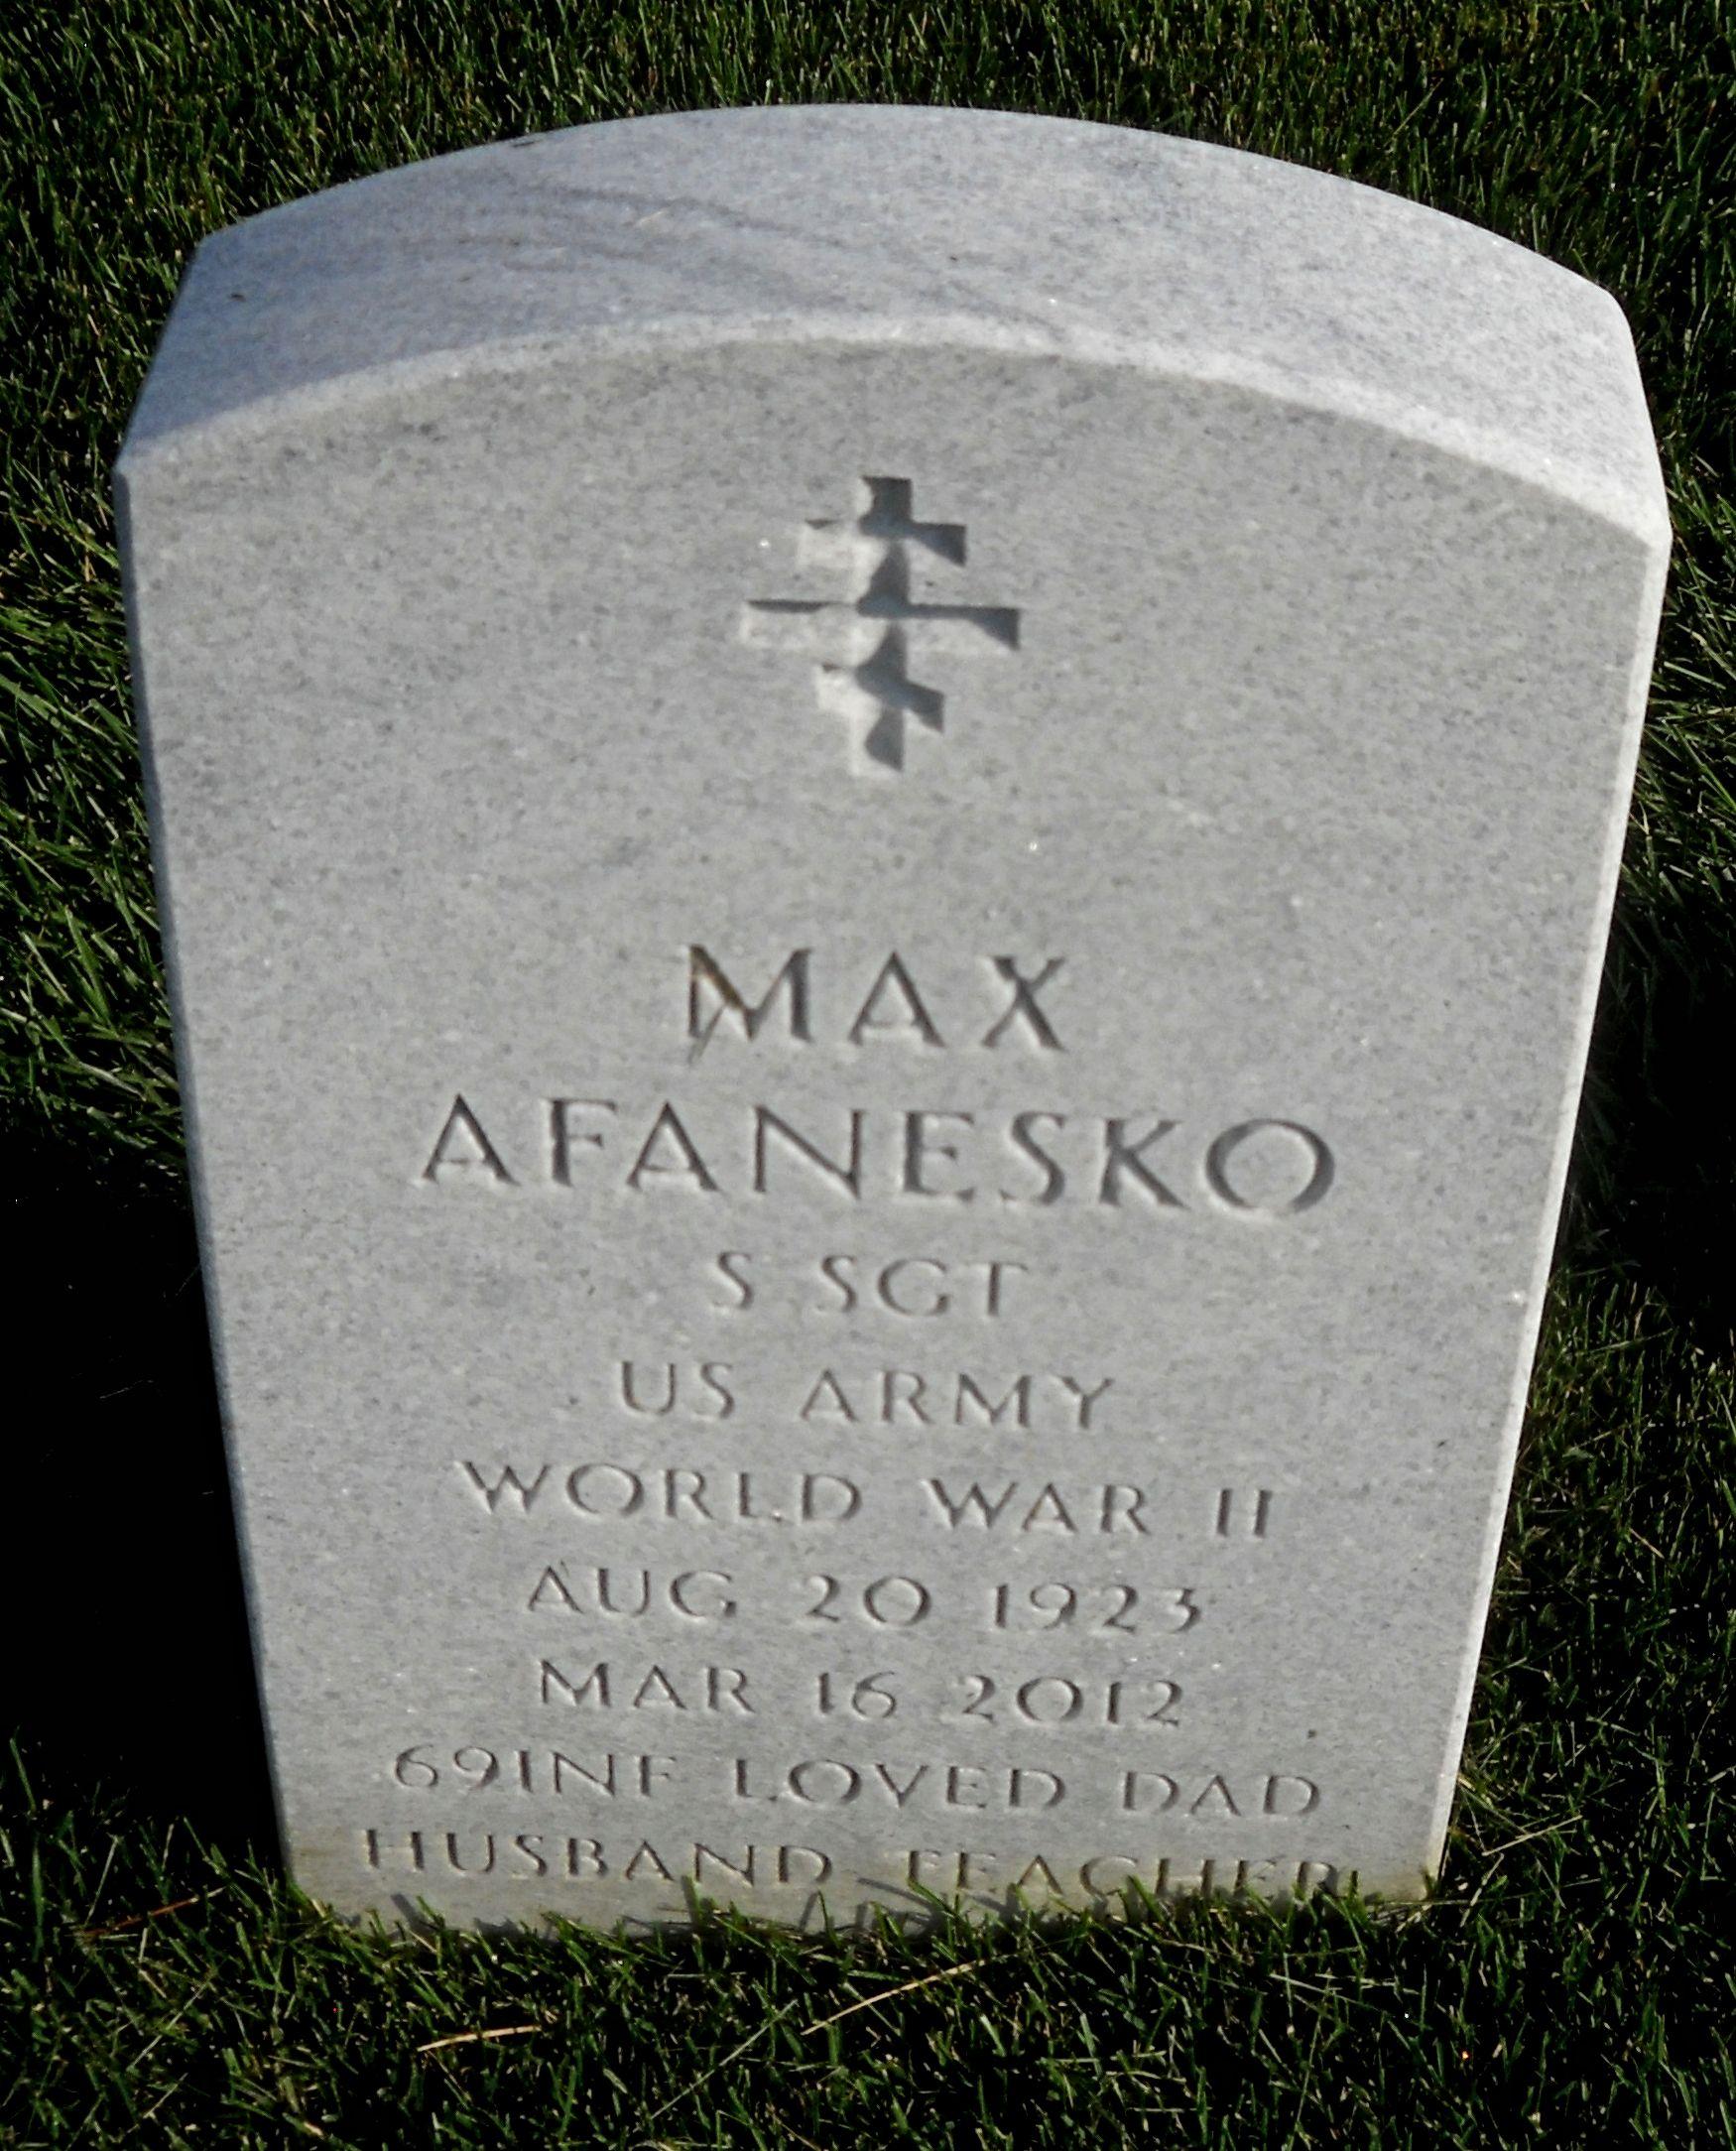 Max Afanesko